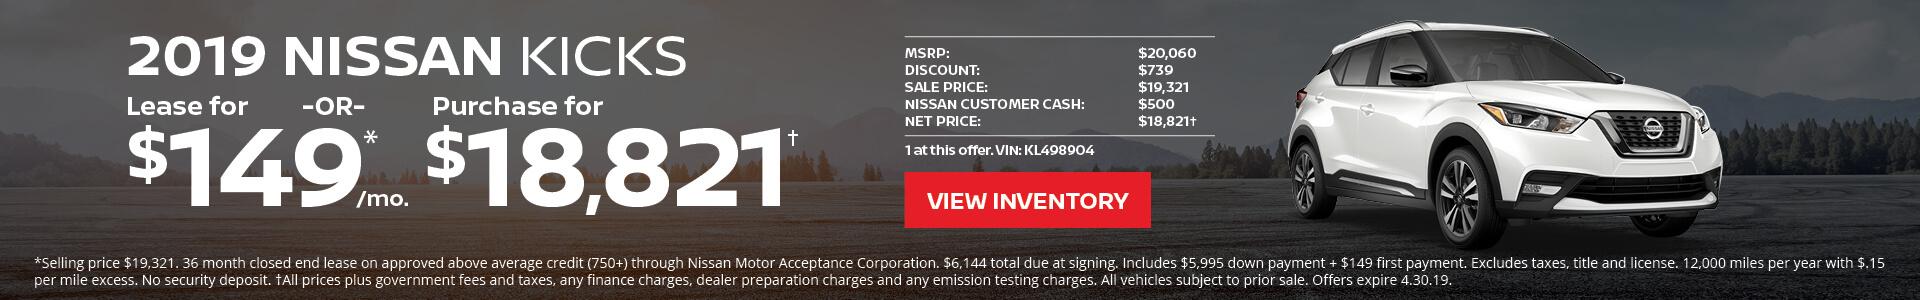 Nissan Kicks $149 Lease